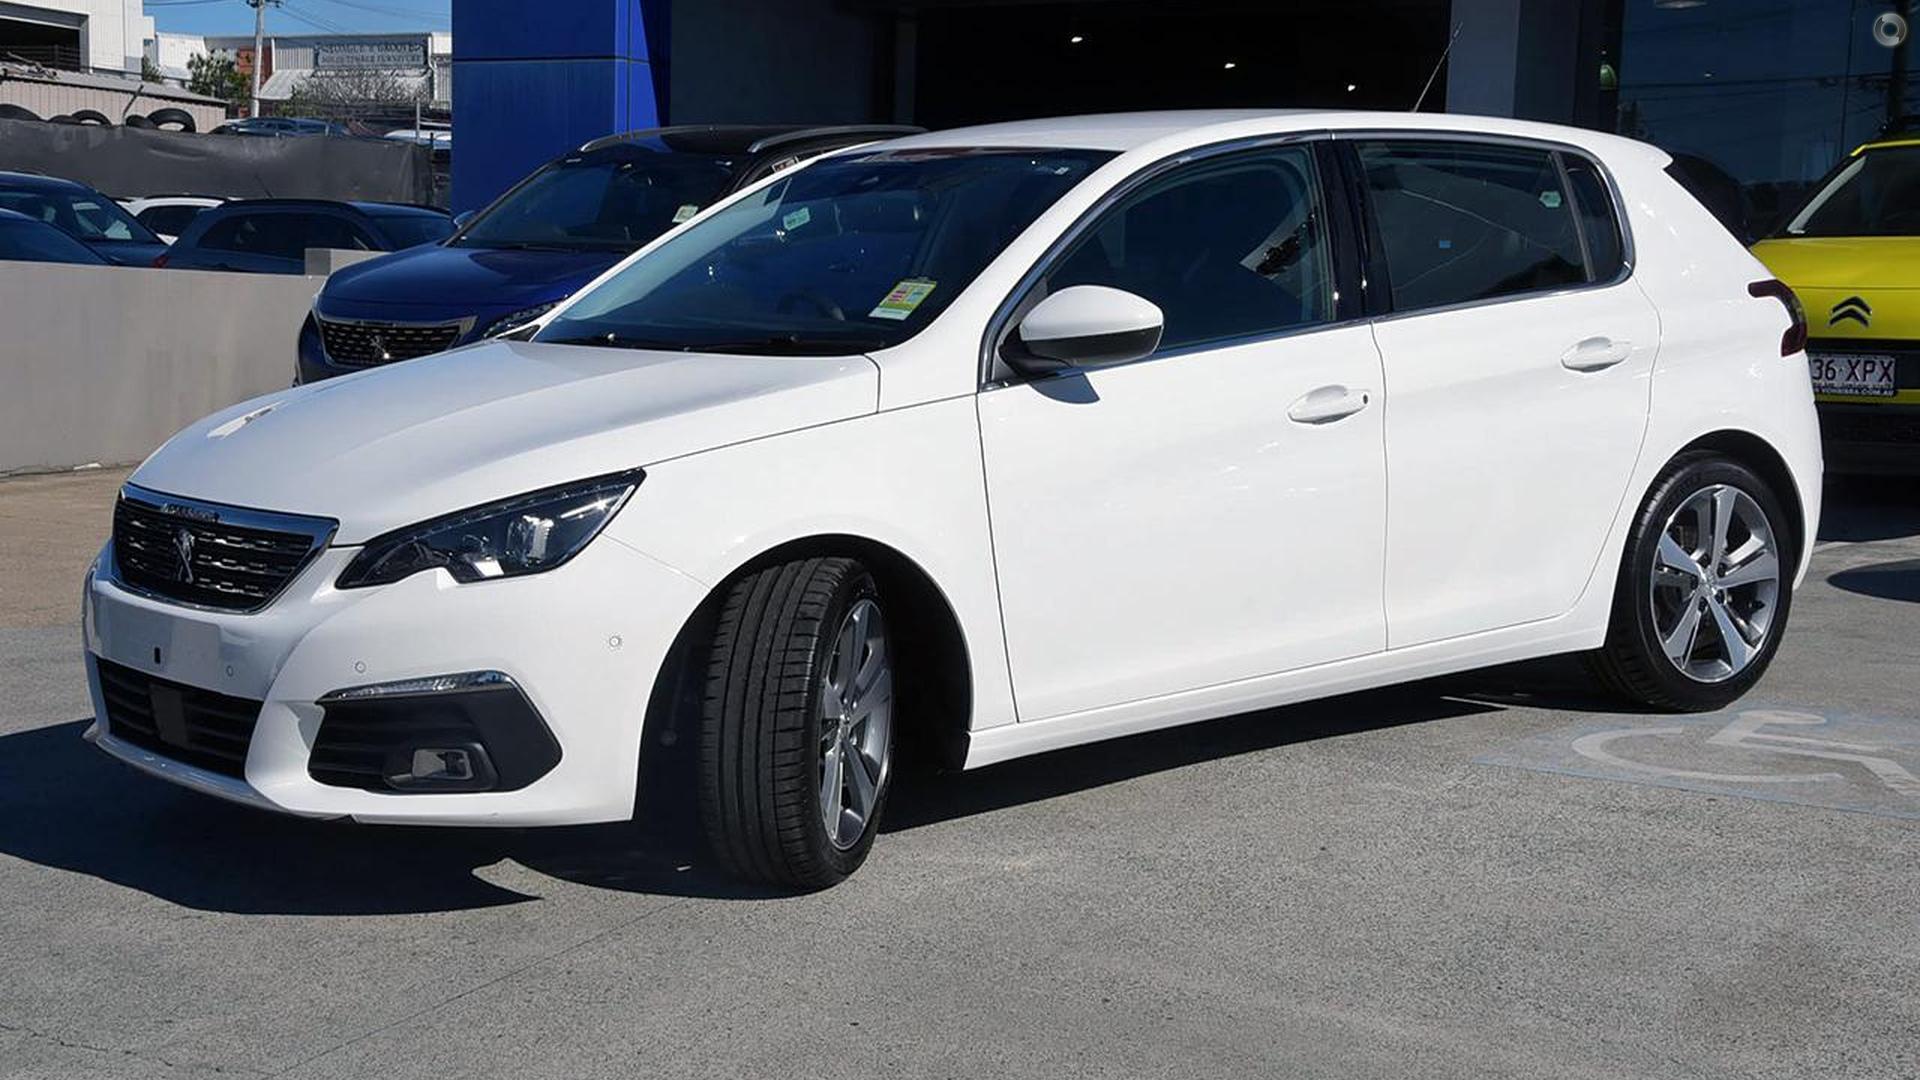 2018 Peugeot 308 T9